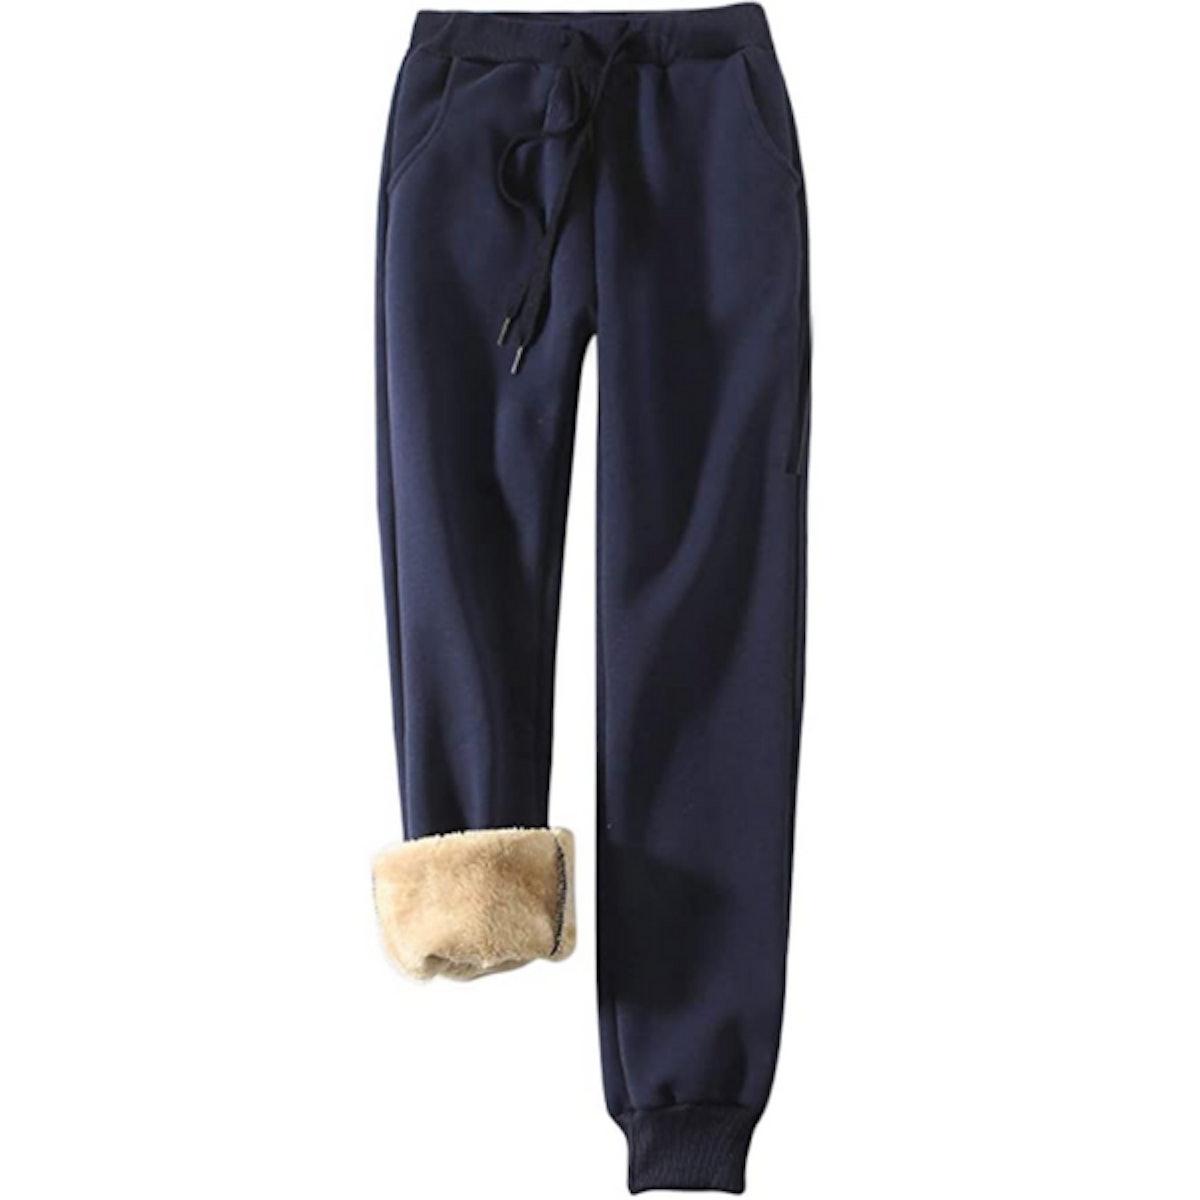 Yeokou Sherpa Lined Jogger Sweatpants